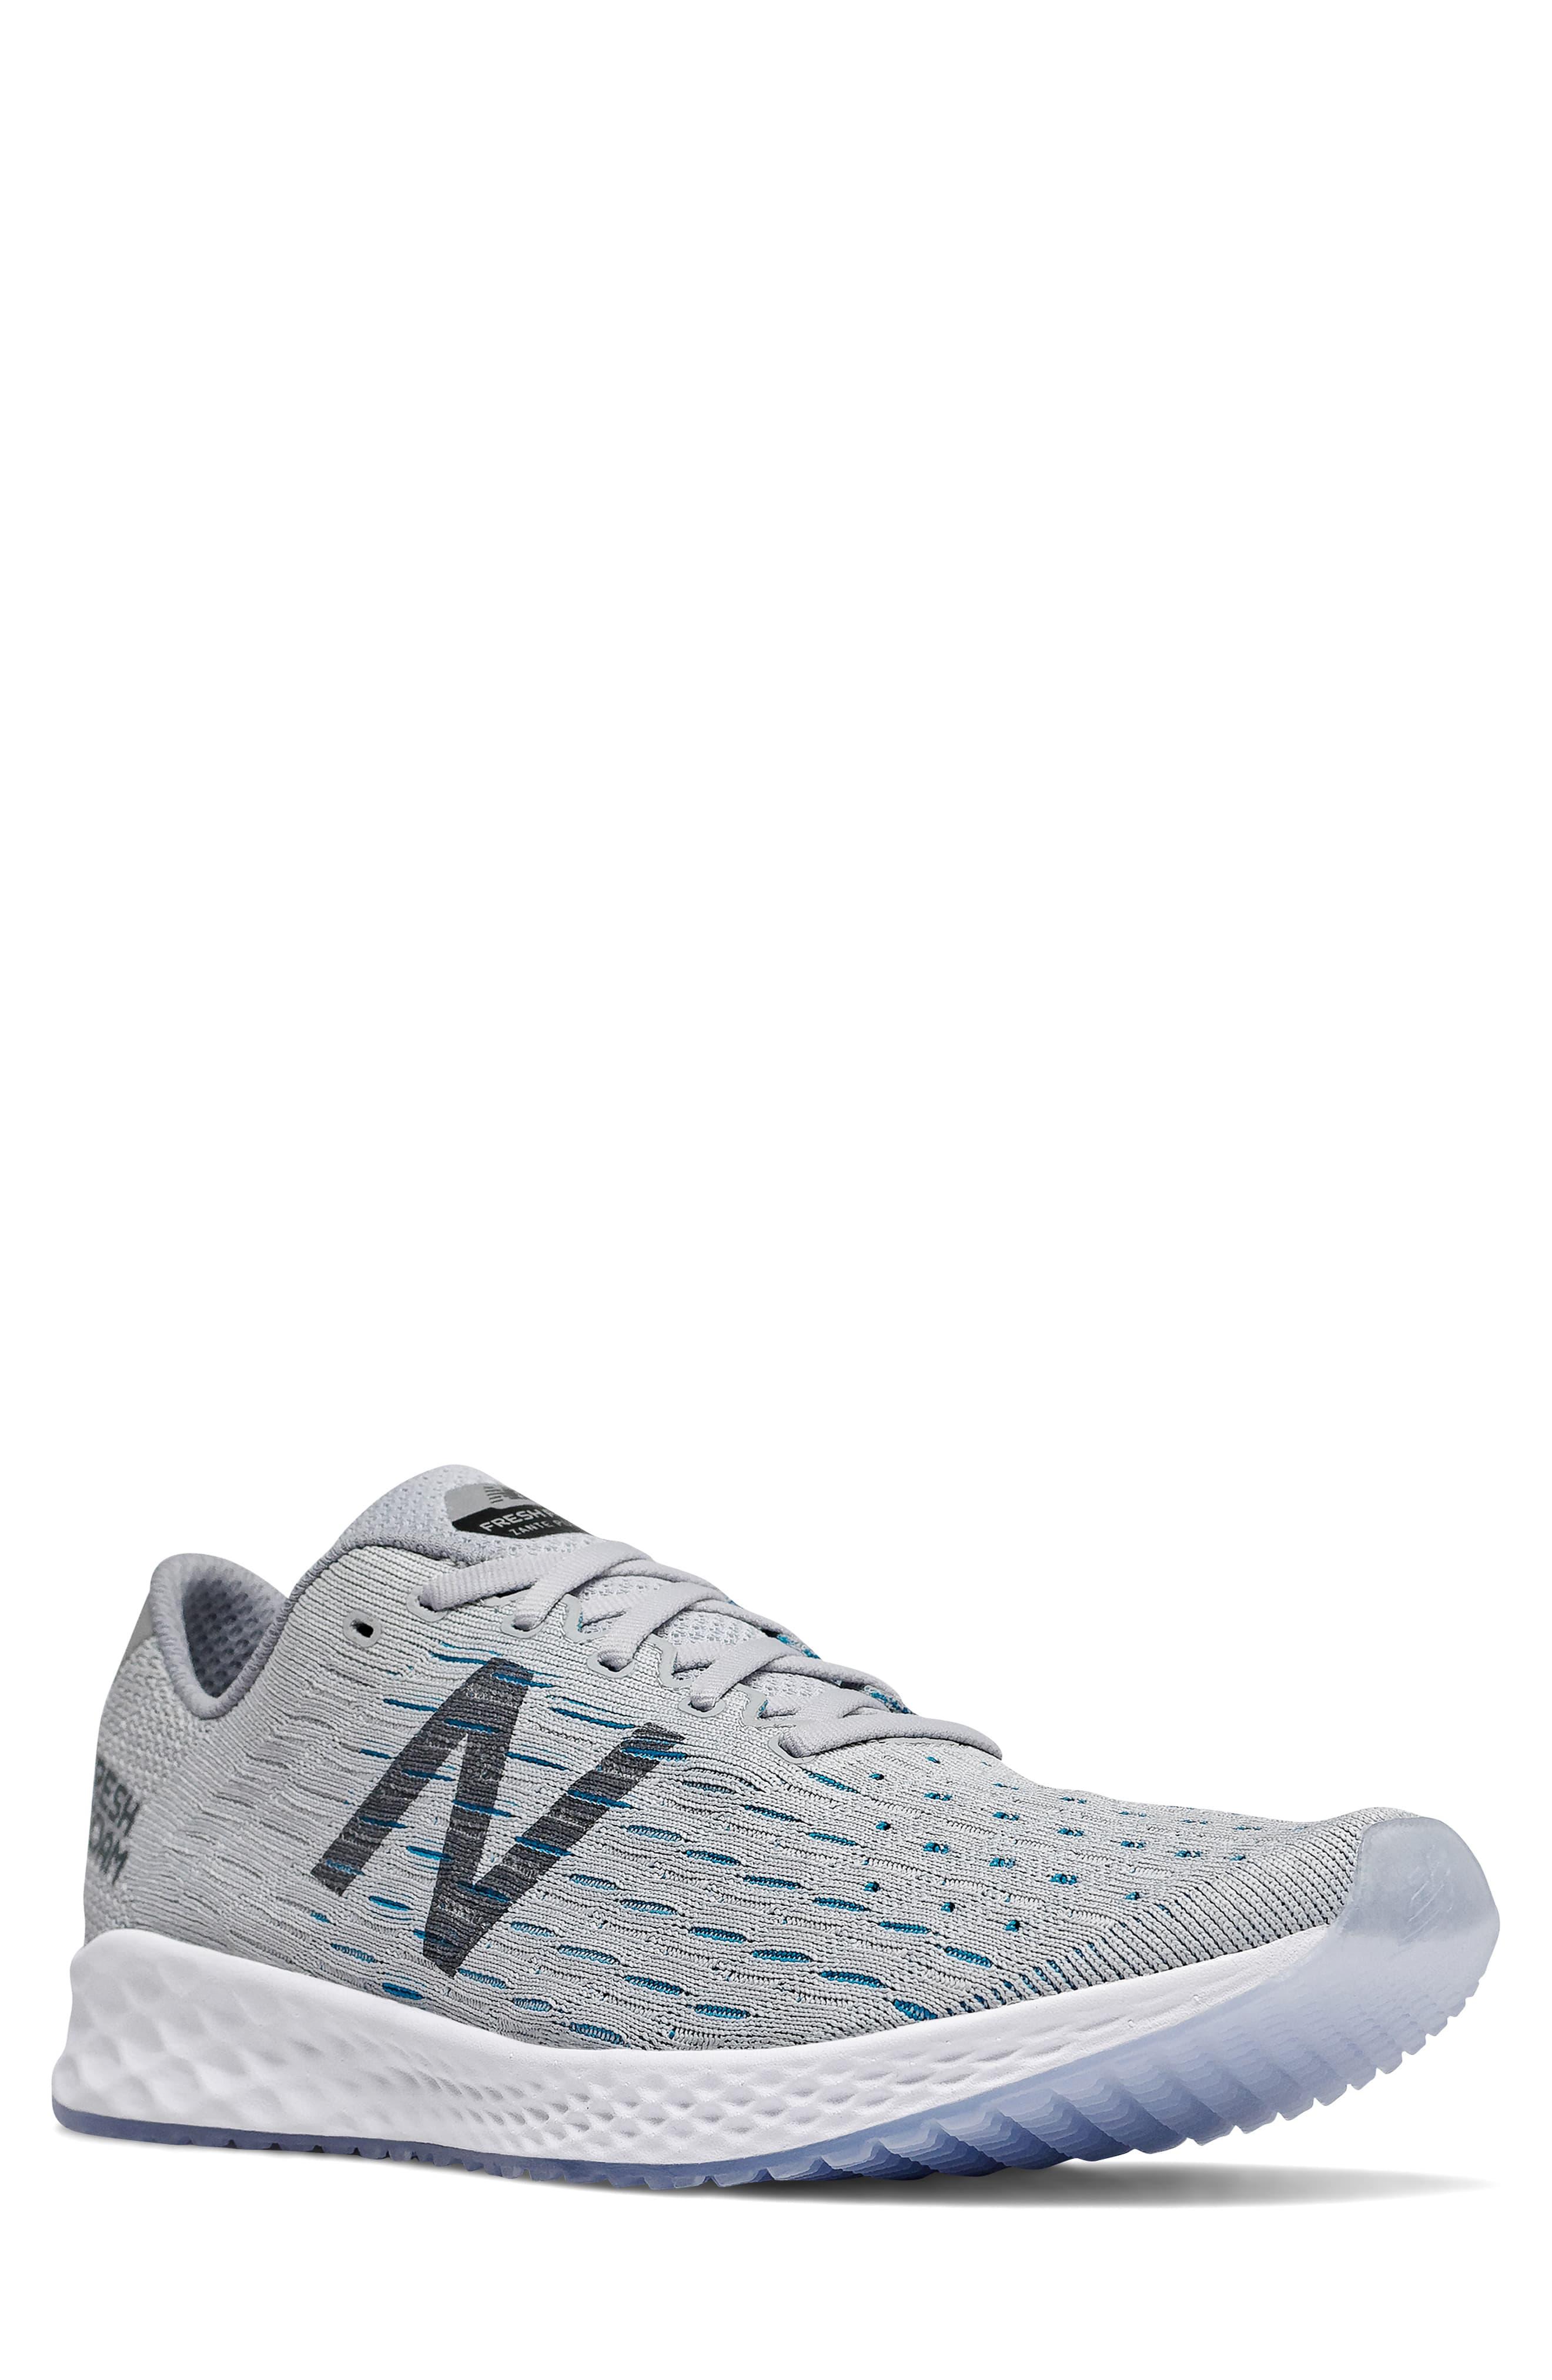 Men's New Balance Running Shoes | Free Shipping & Returns